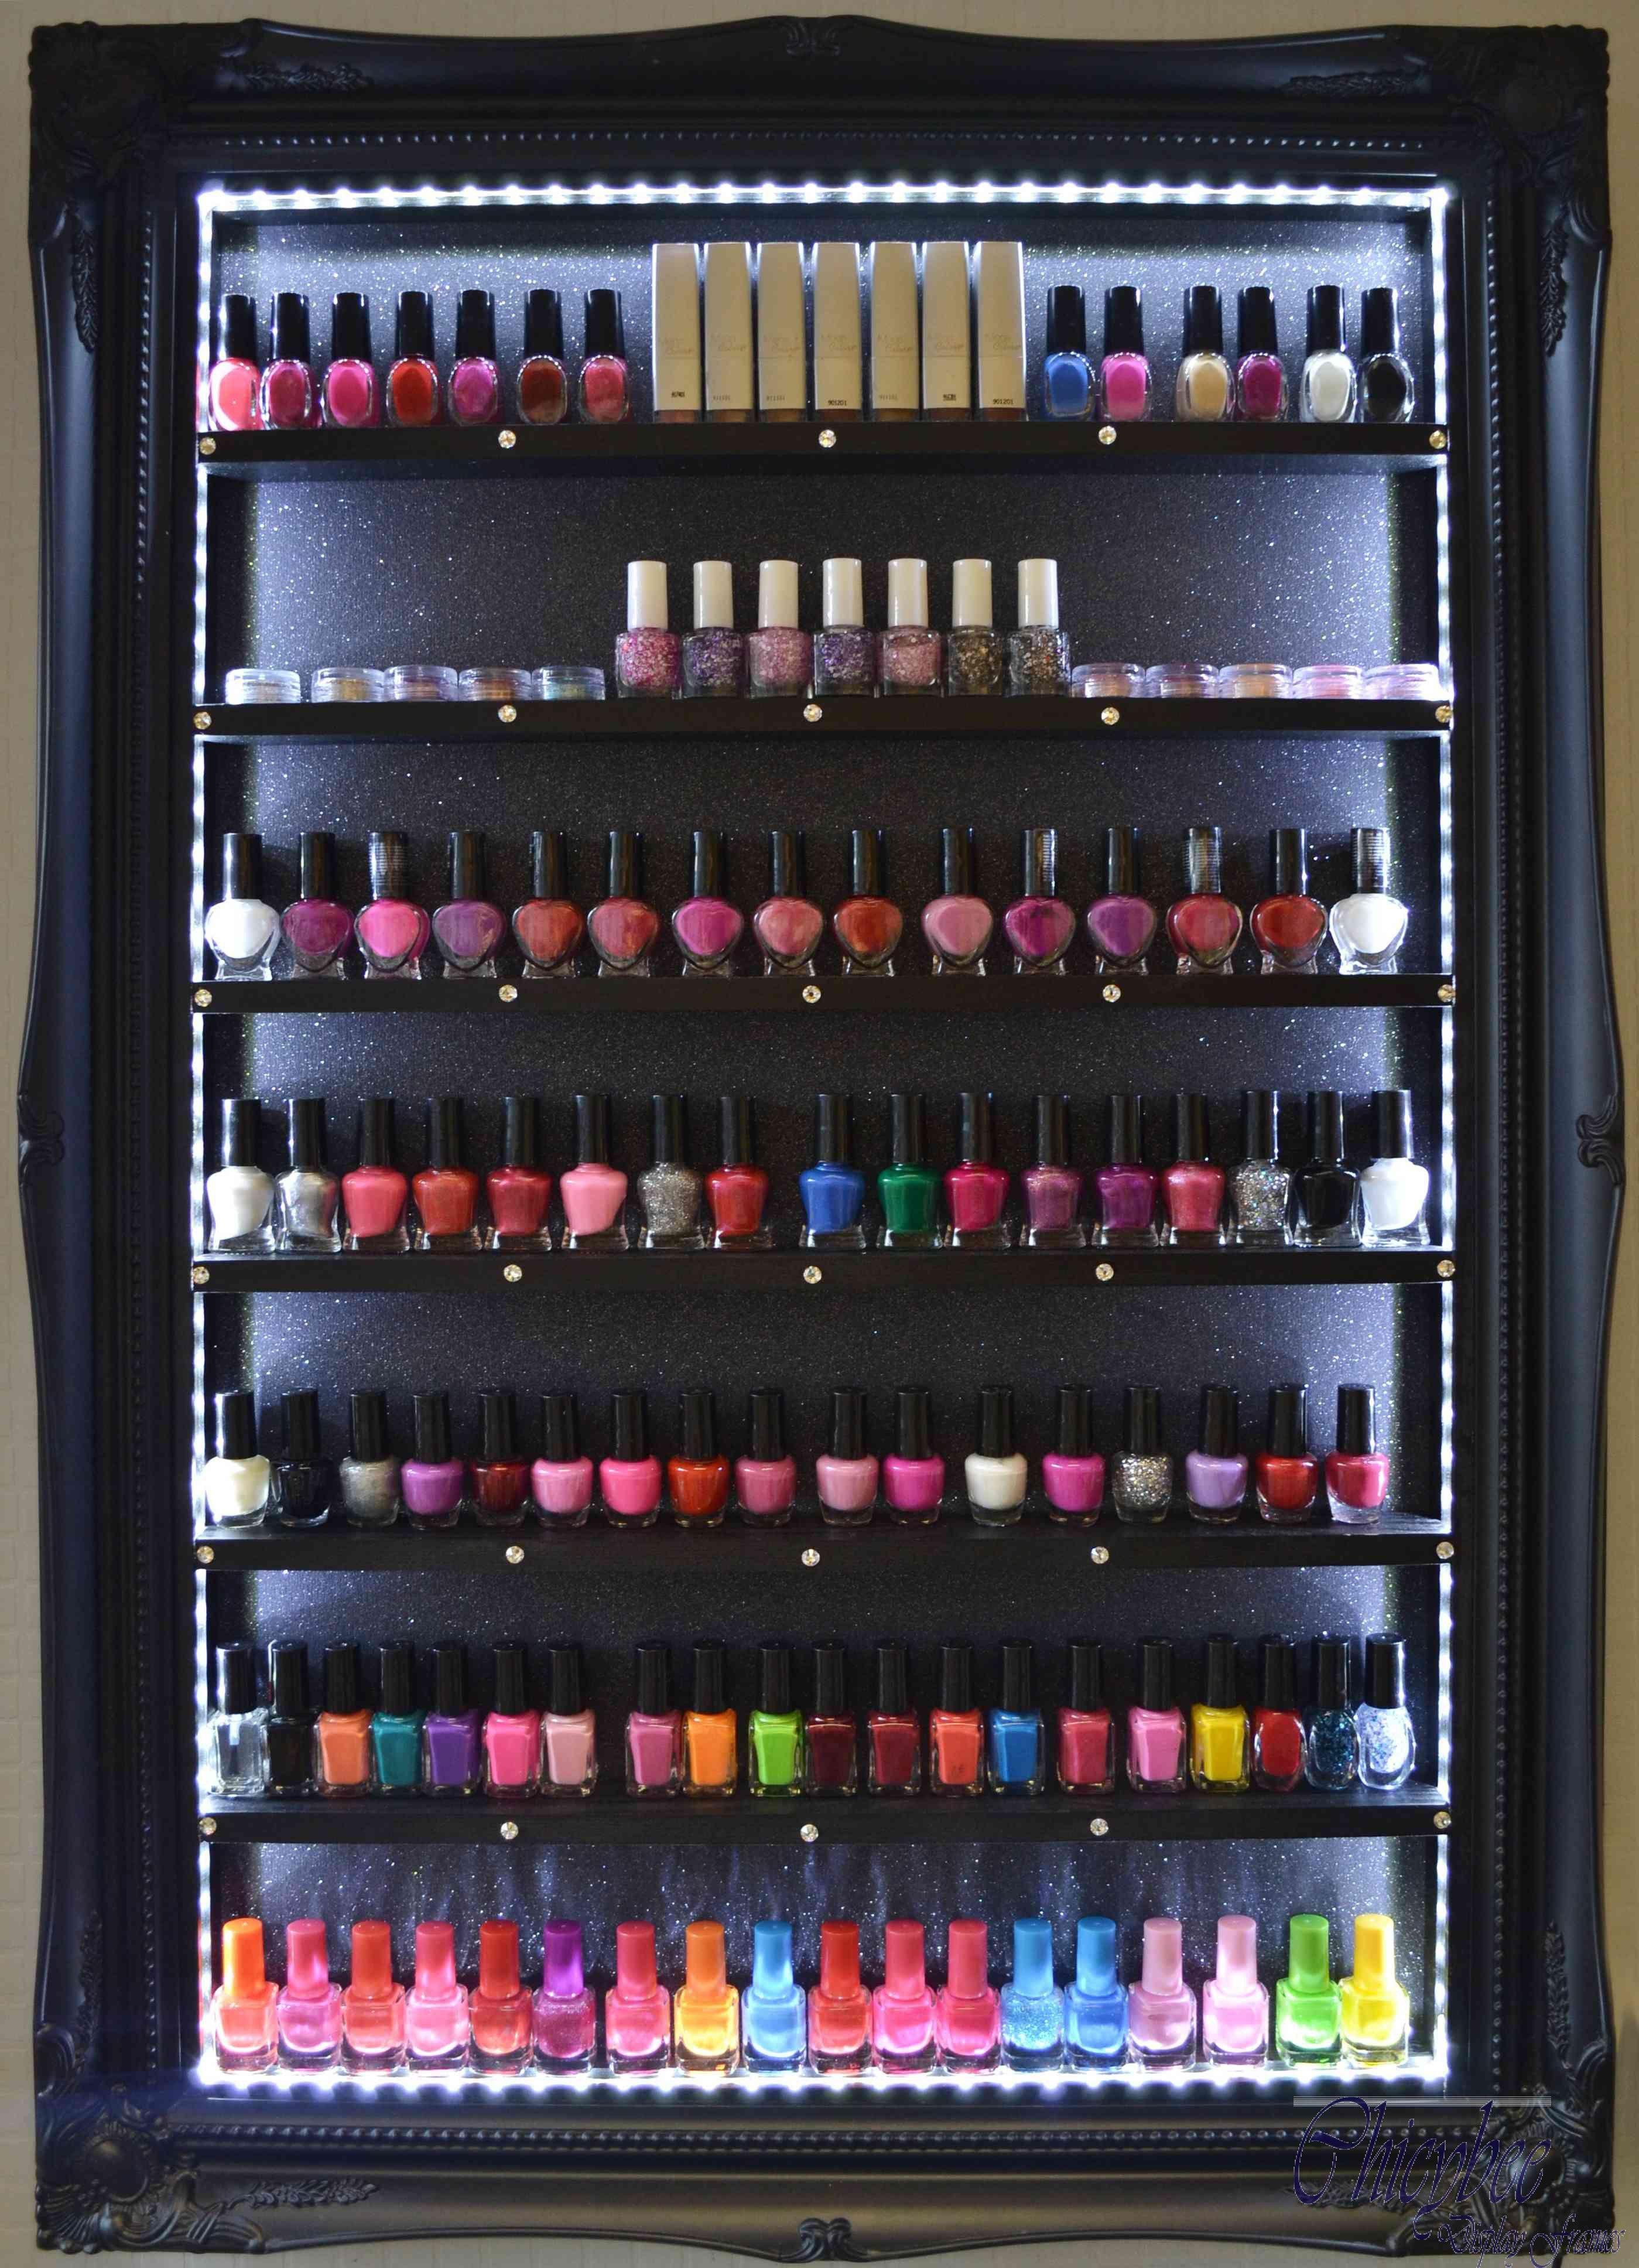 Uncategorized Nail Varnish Organiser nail polish rack beauty product organiser black glitter led lights and swarovski crystals